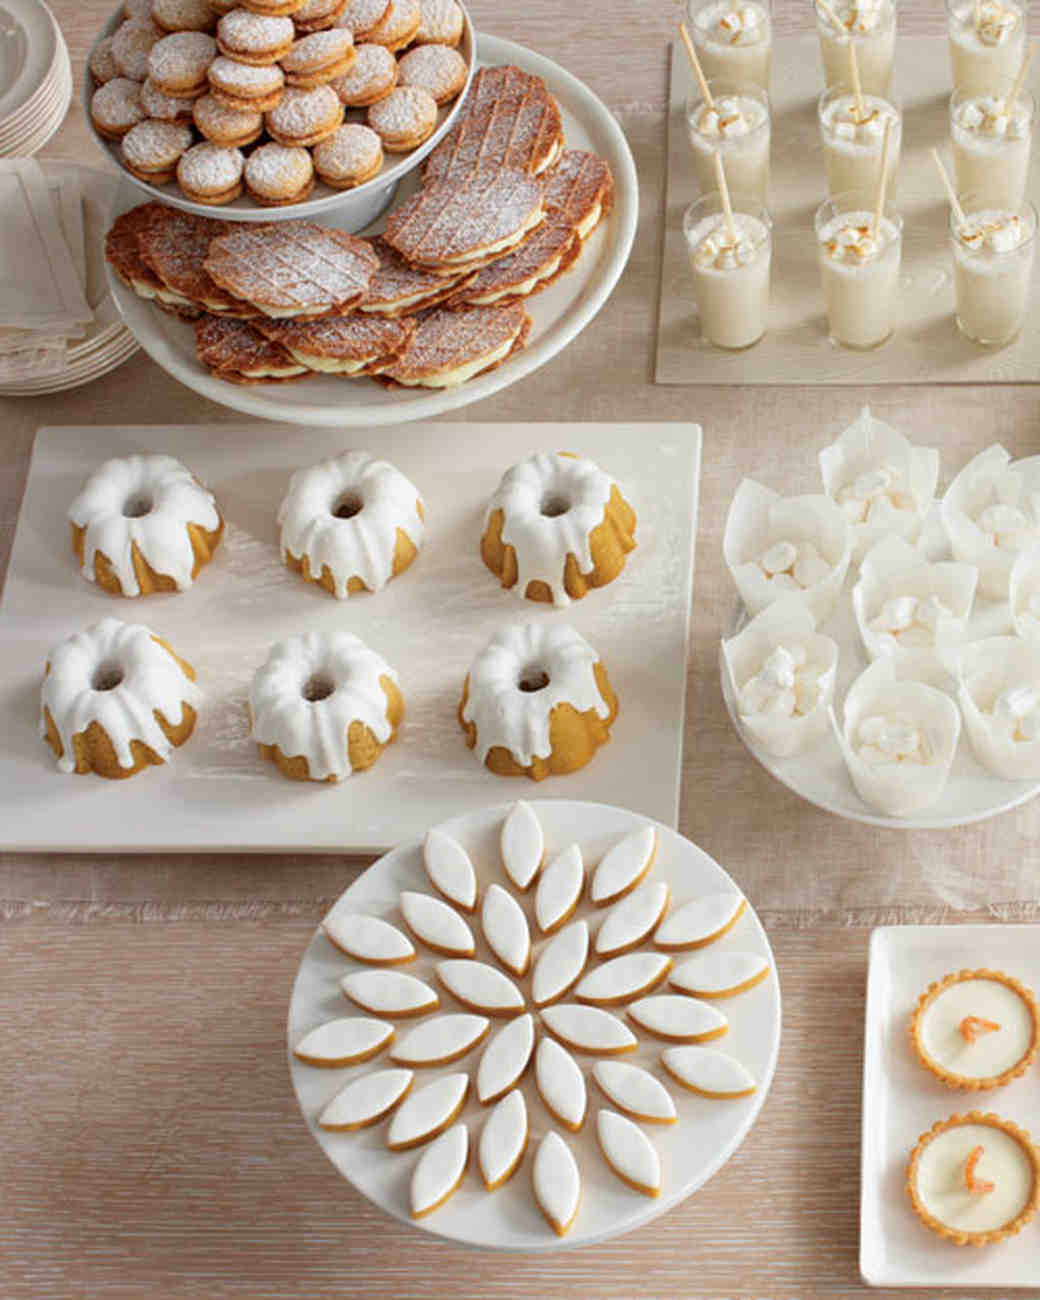 Lemon-Cream Cheese Sandwich Cookies